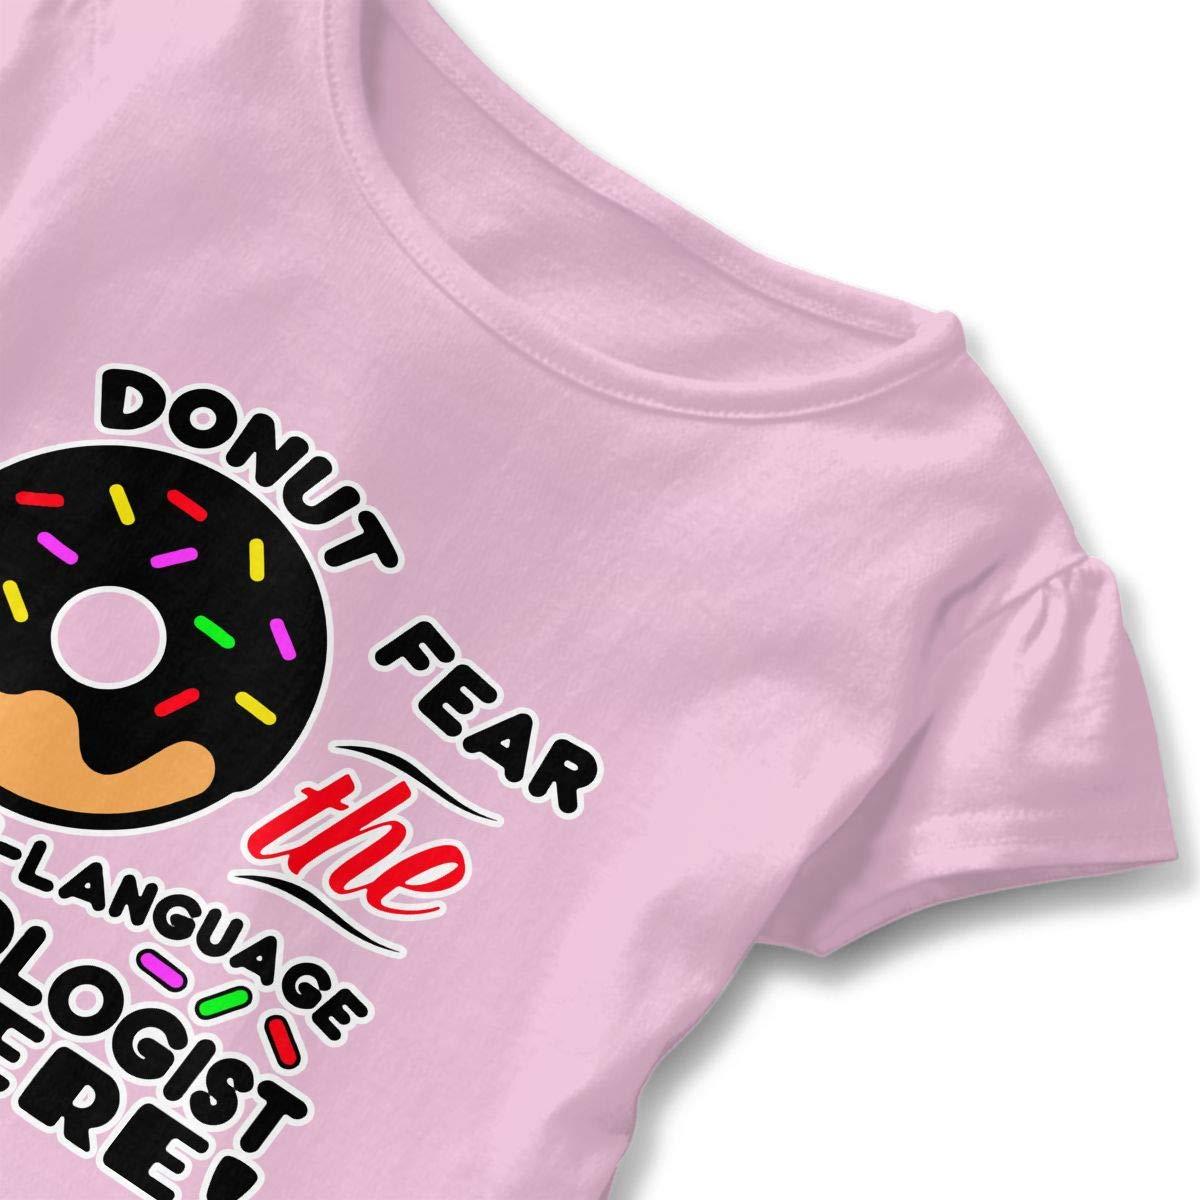 Speech-Language Pathologist Donut Fear Toddler Baby Girl Ruffle Short Sleeve T-Shirt Cute Cotton T Shirts